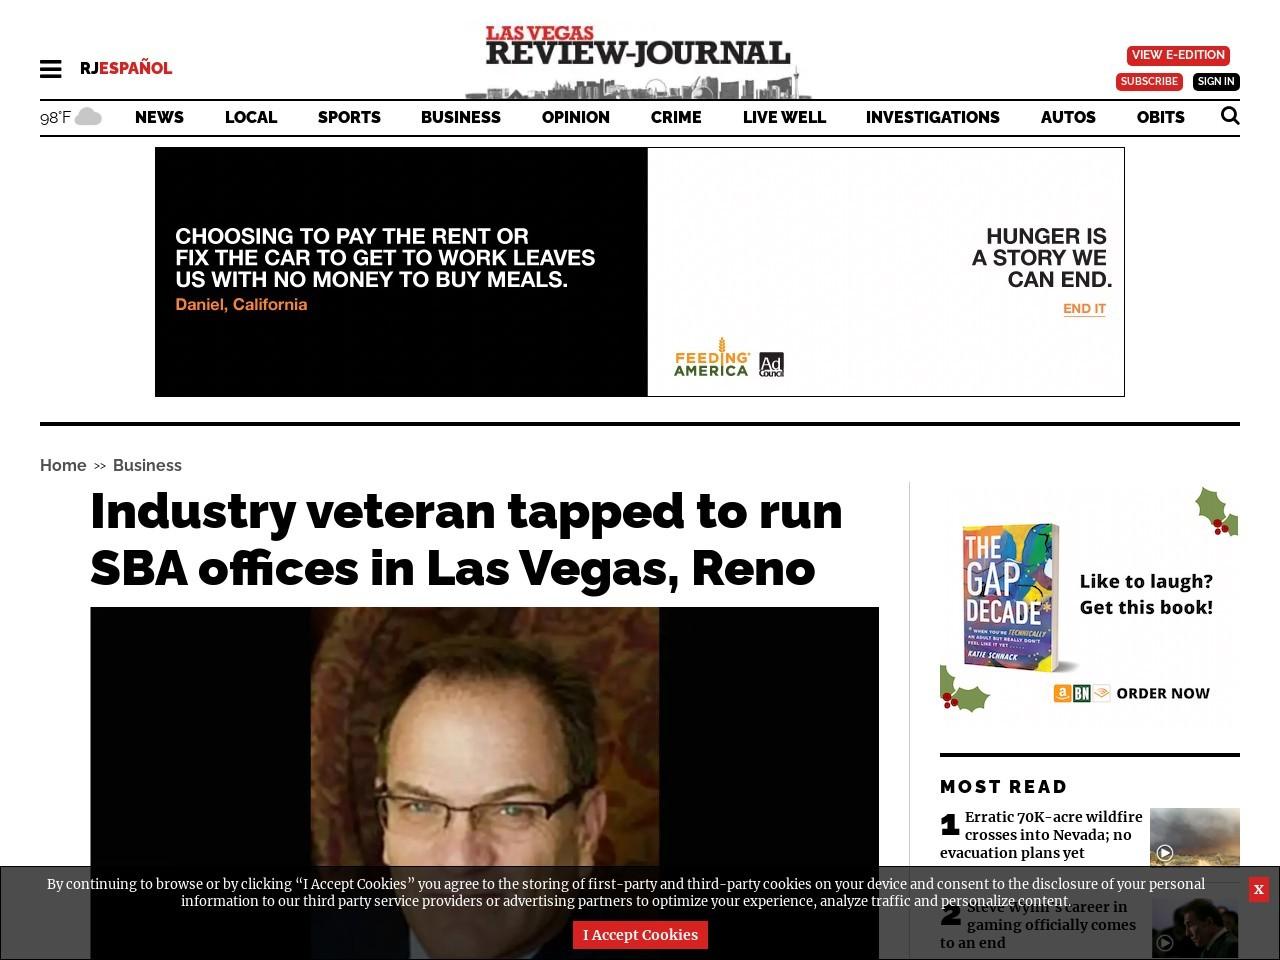 Industry veteran tapped to run SBA offices in Las Vegas, Reno